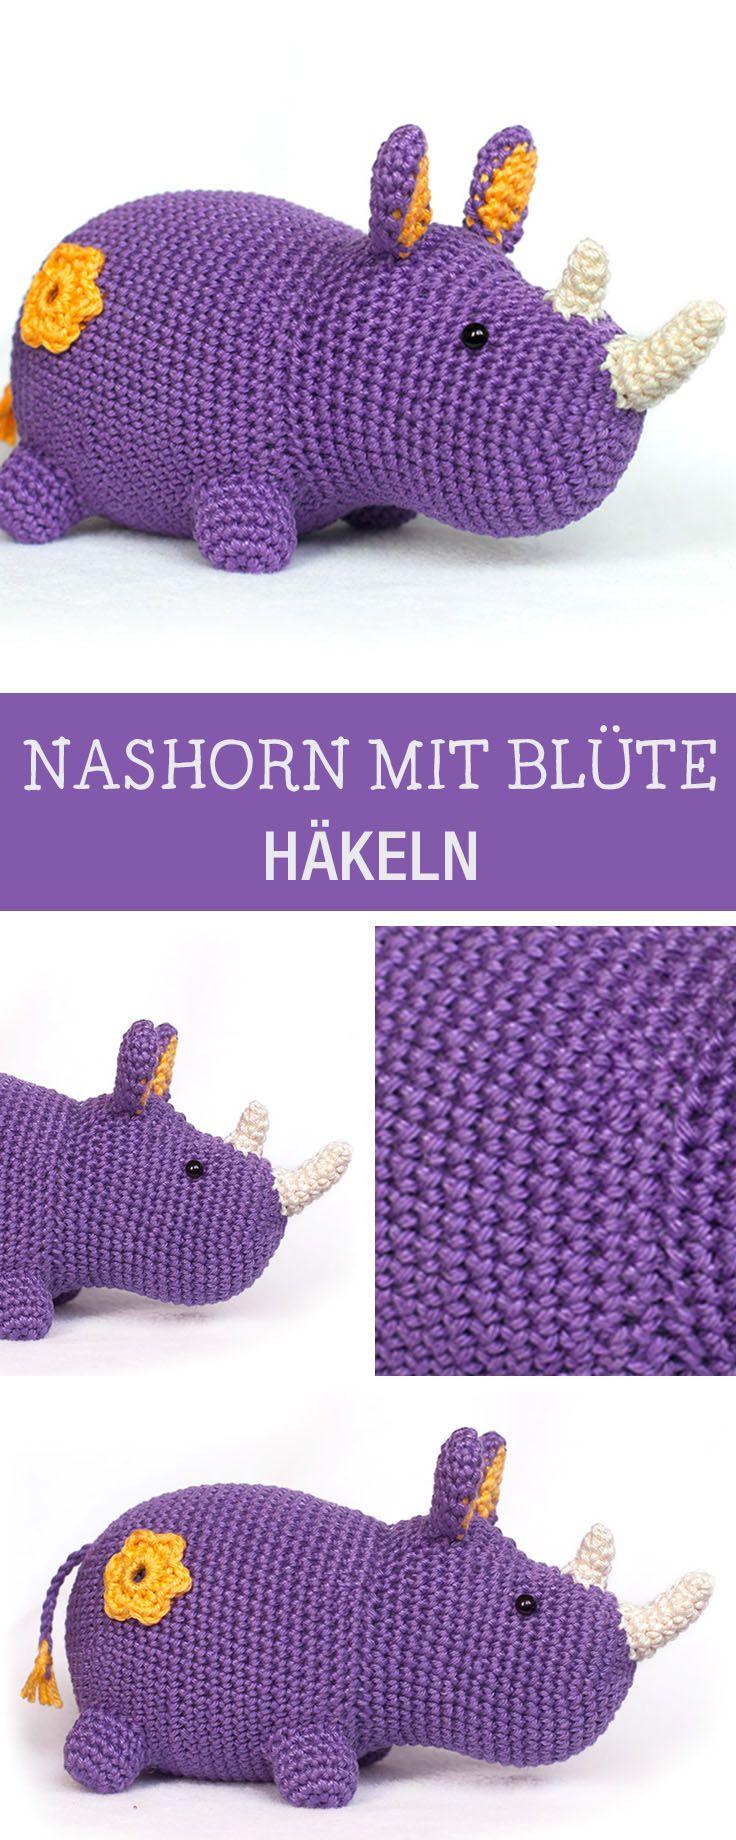 Kostenlose Häkelanleitung für ein Amigurumi Nashorn mit Blüte / amigurumi tutorial: crocheted hippo via DaWanda.com #amigurumitutorial